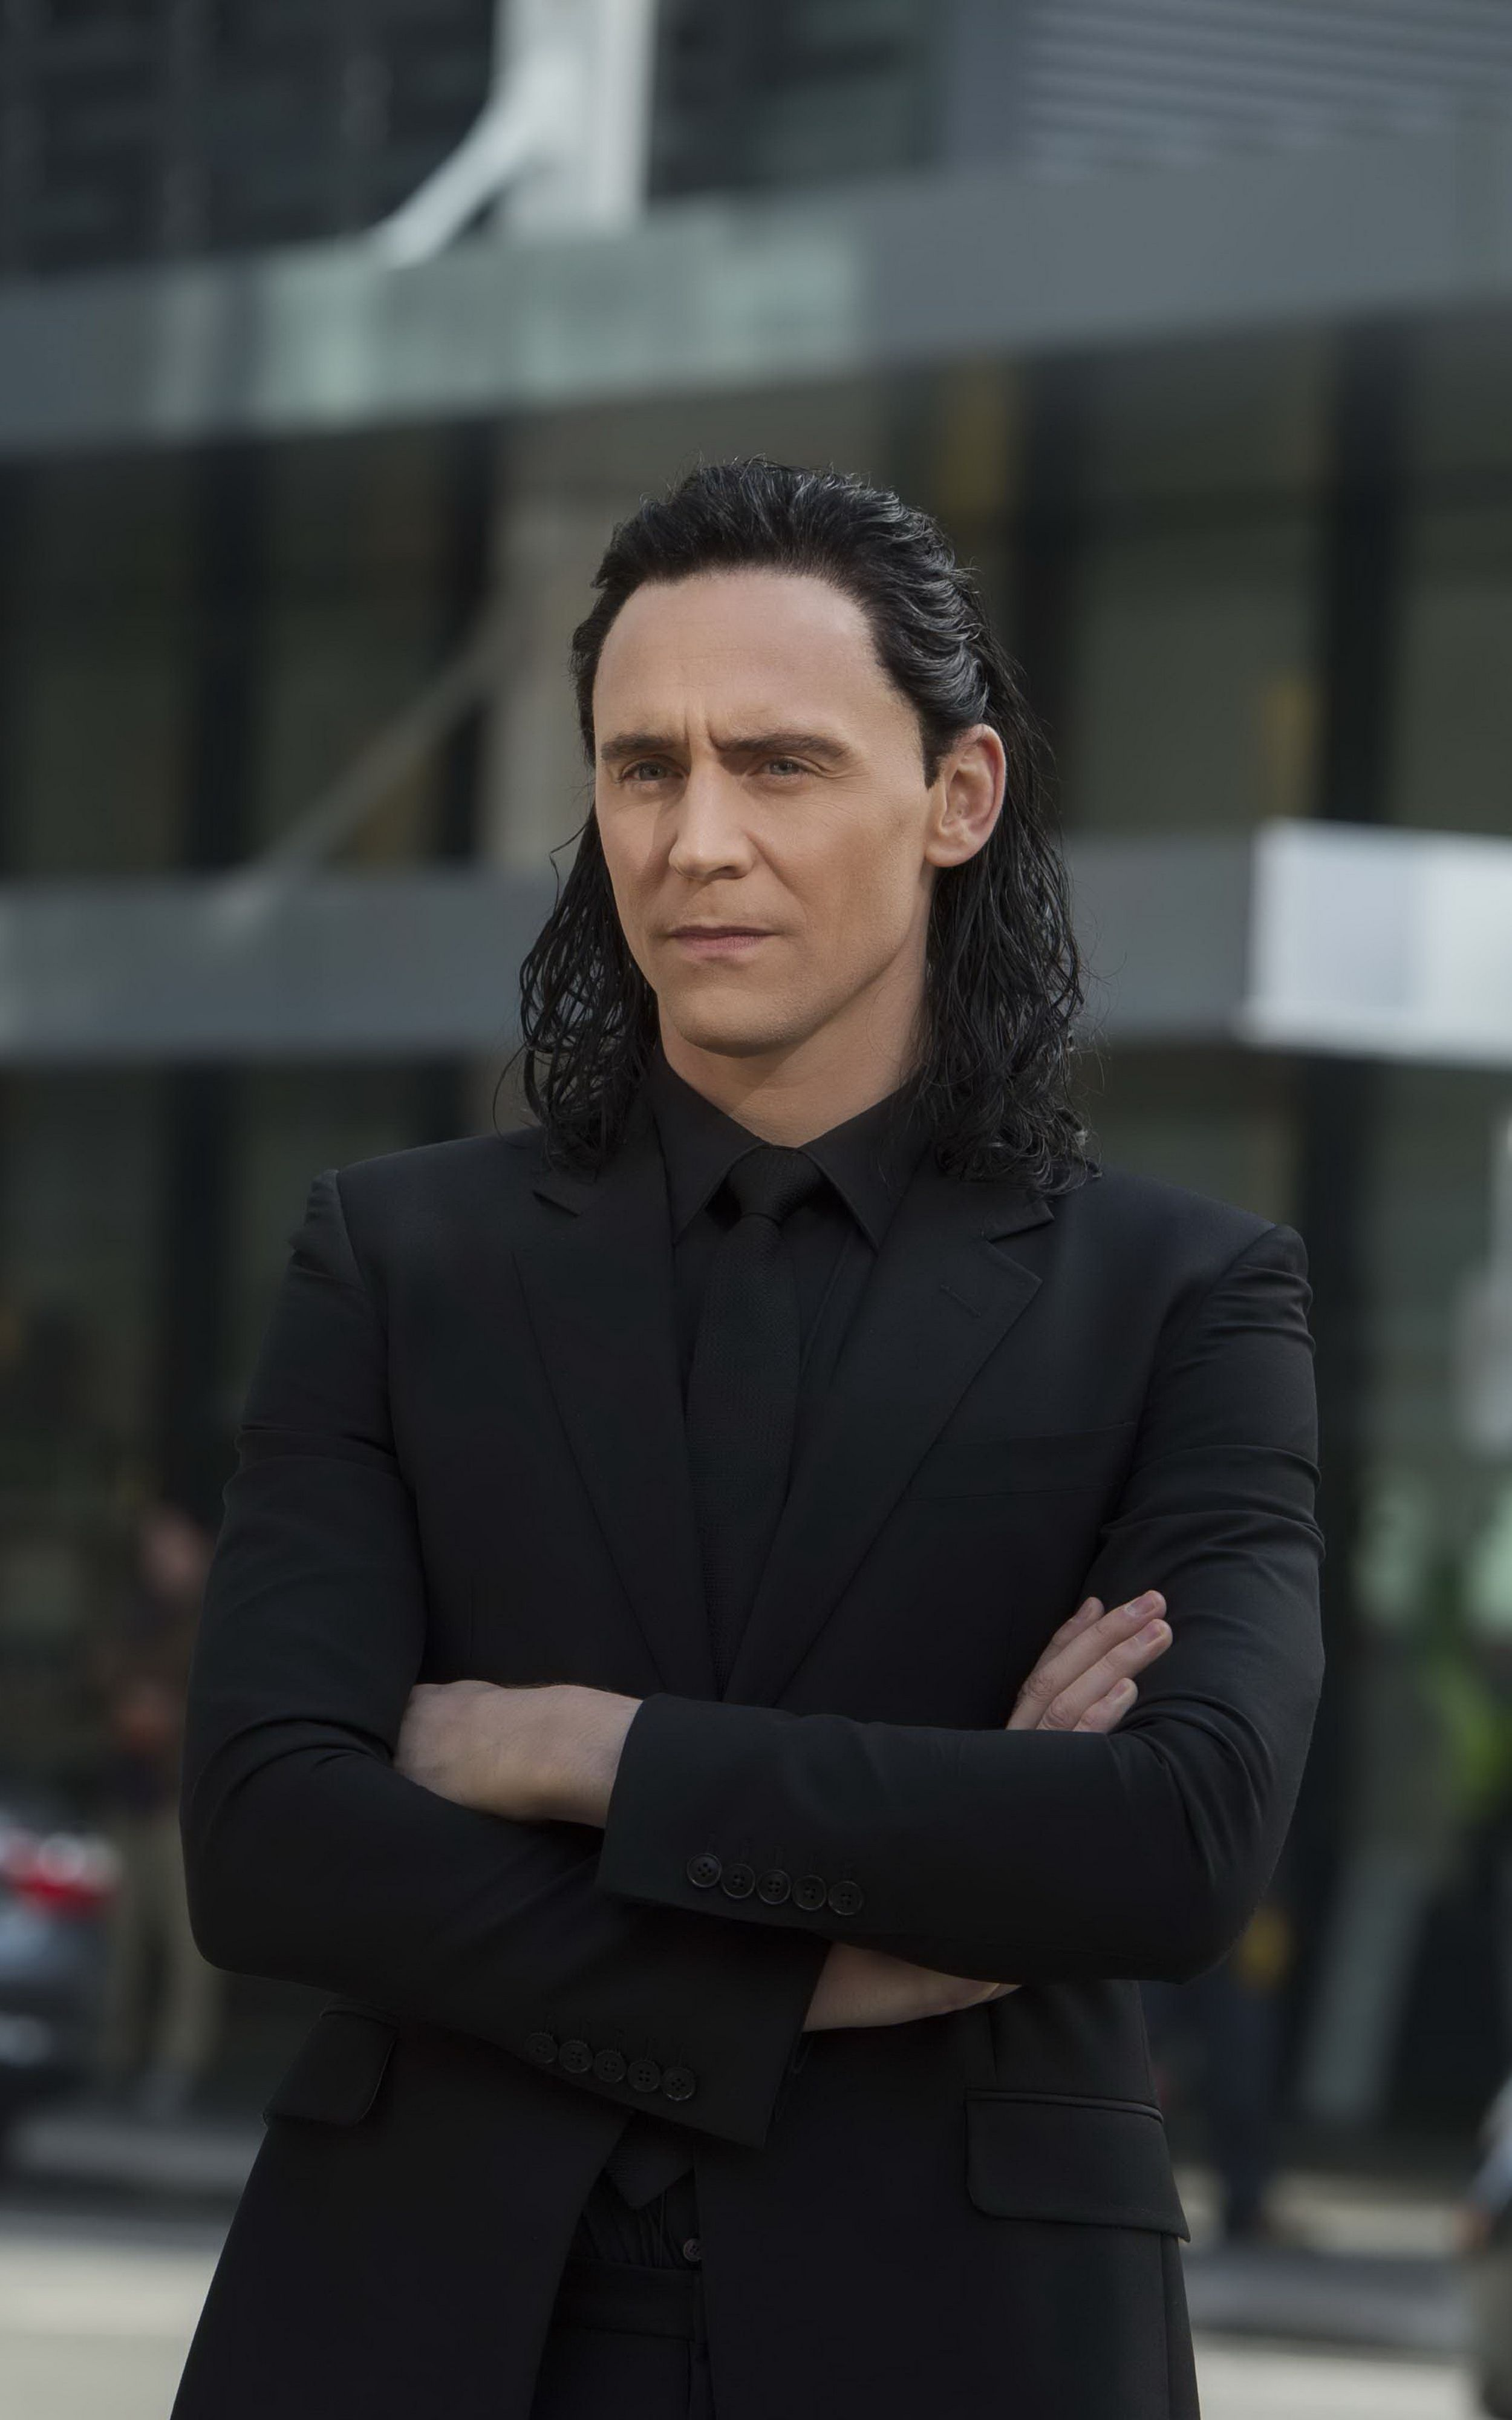 Image Result For Thor Ragnarok Loki Wallpaper Loki Wallpaper Loki Loki Laufeyson